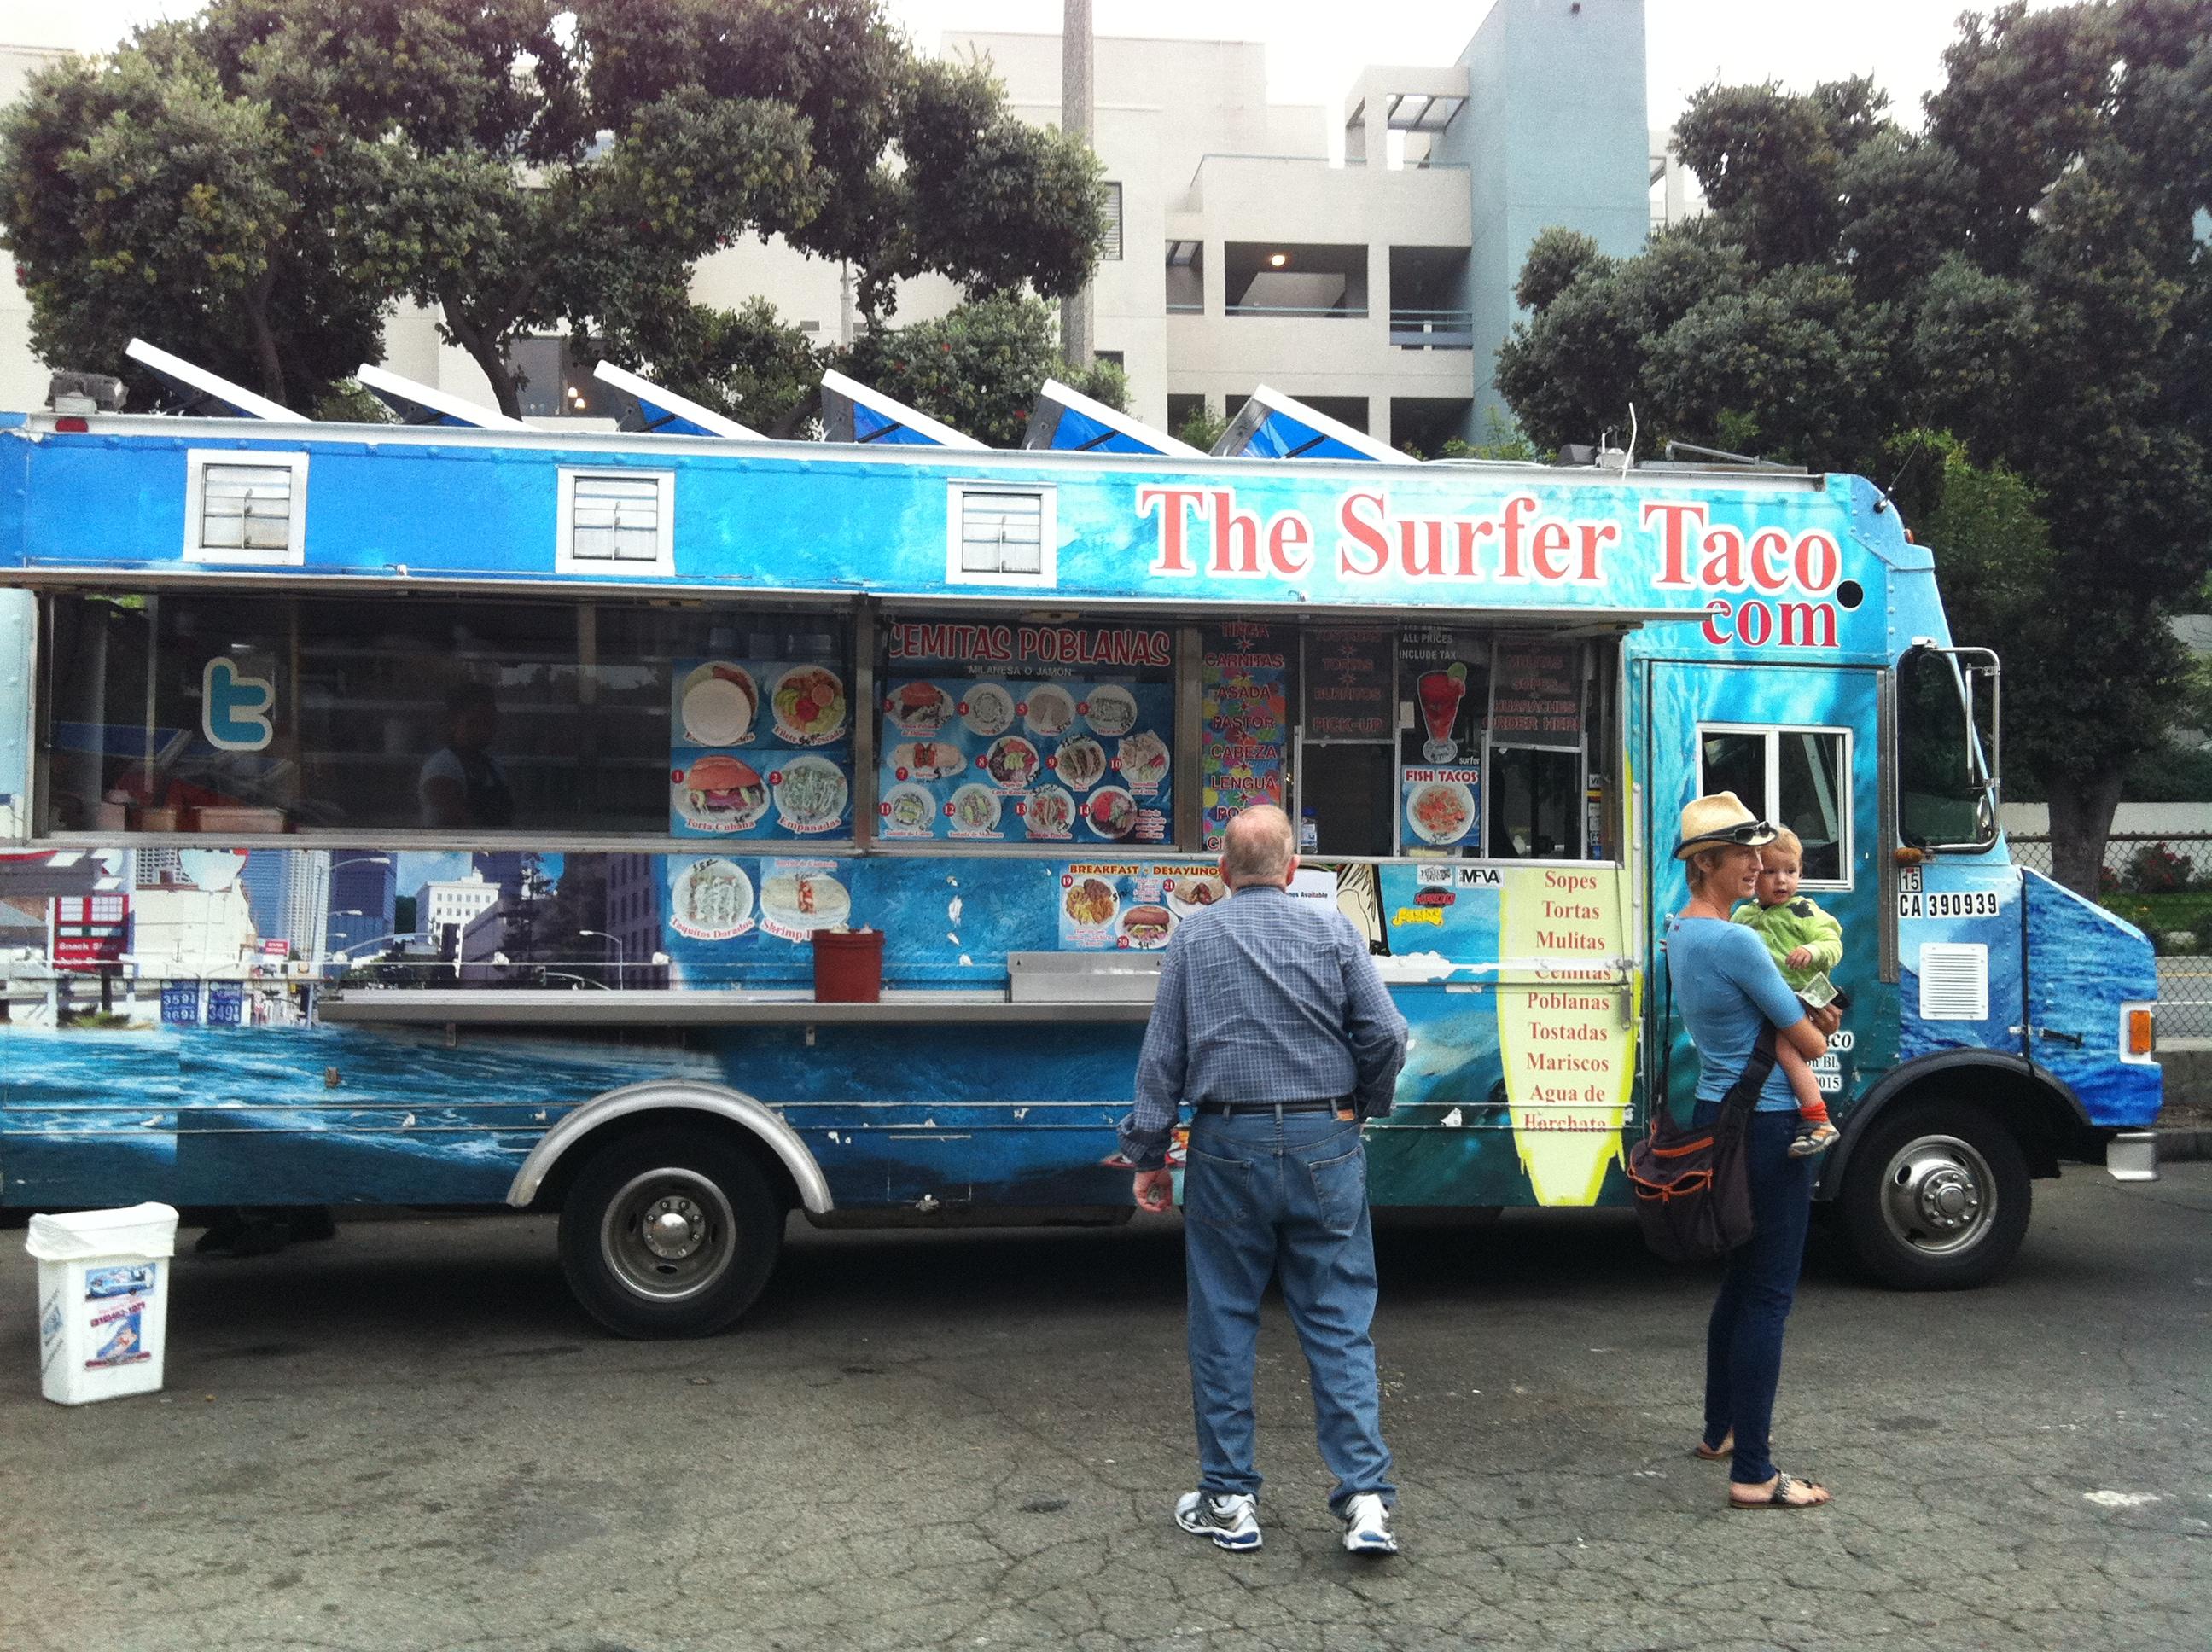 Santa Monica Main Street Tuesday Food Trucks